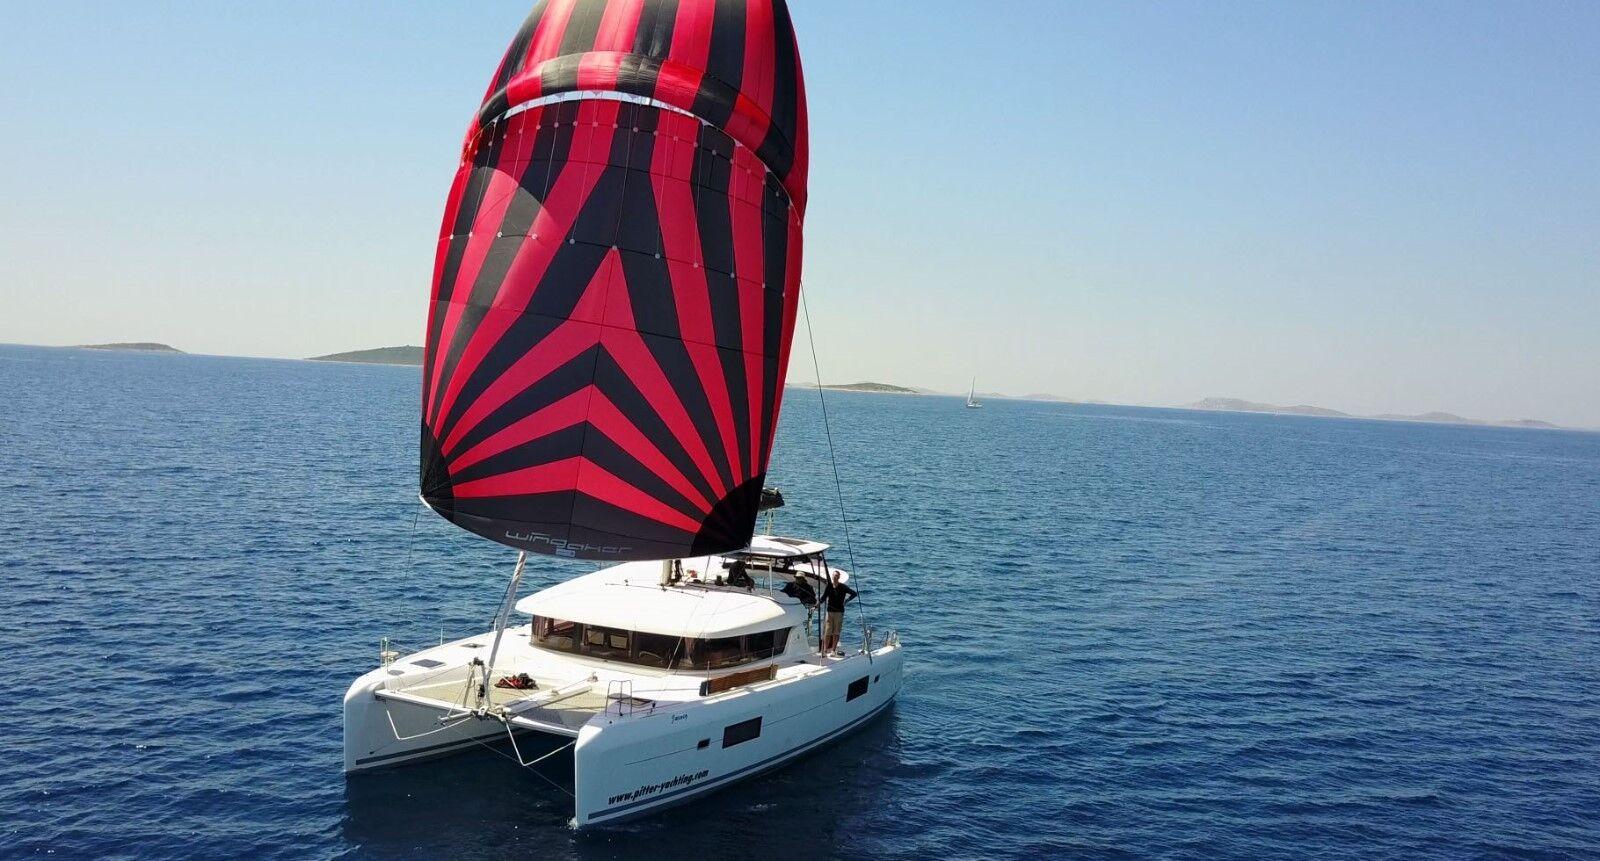 Katamaran- Skippertraining in Sept./Okt. Kroatien + Winter/Kanaren